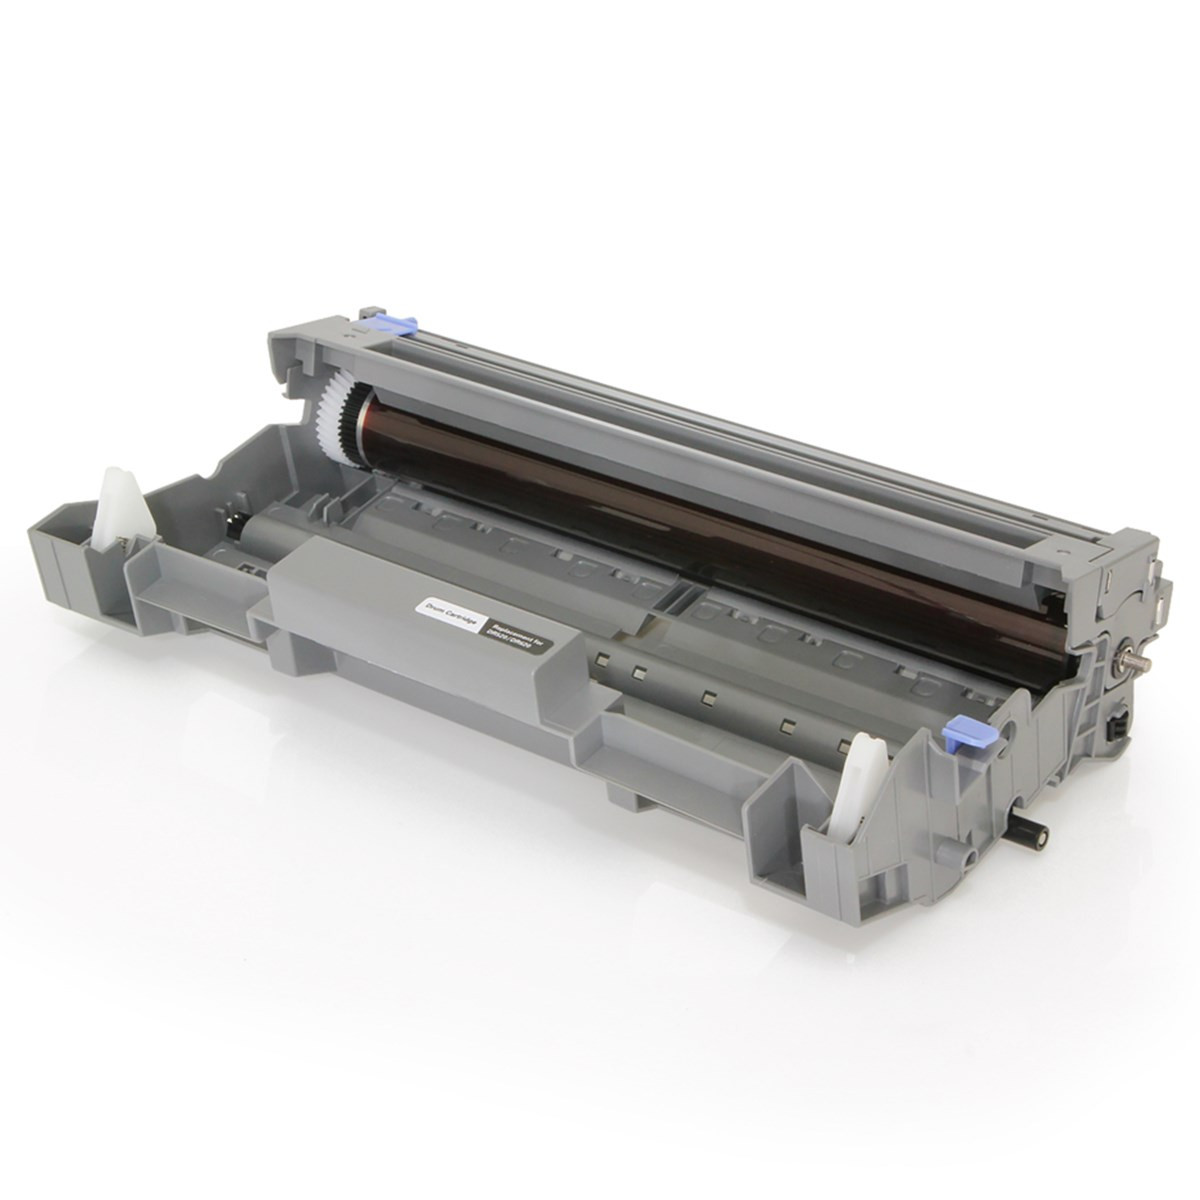 Cartucho de Cilindro Konica Minolta Bizhub 20 Bizhub 20 P | Katun Select 25K